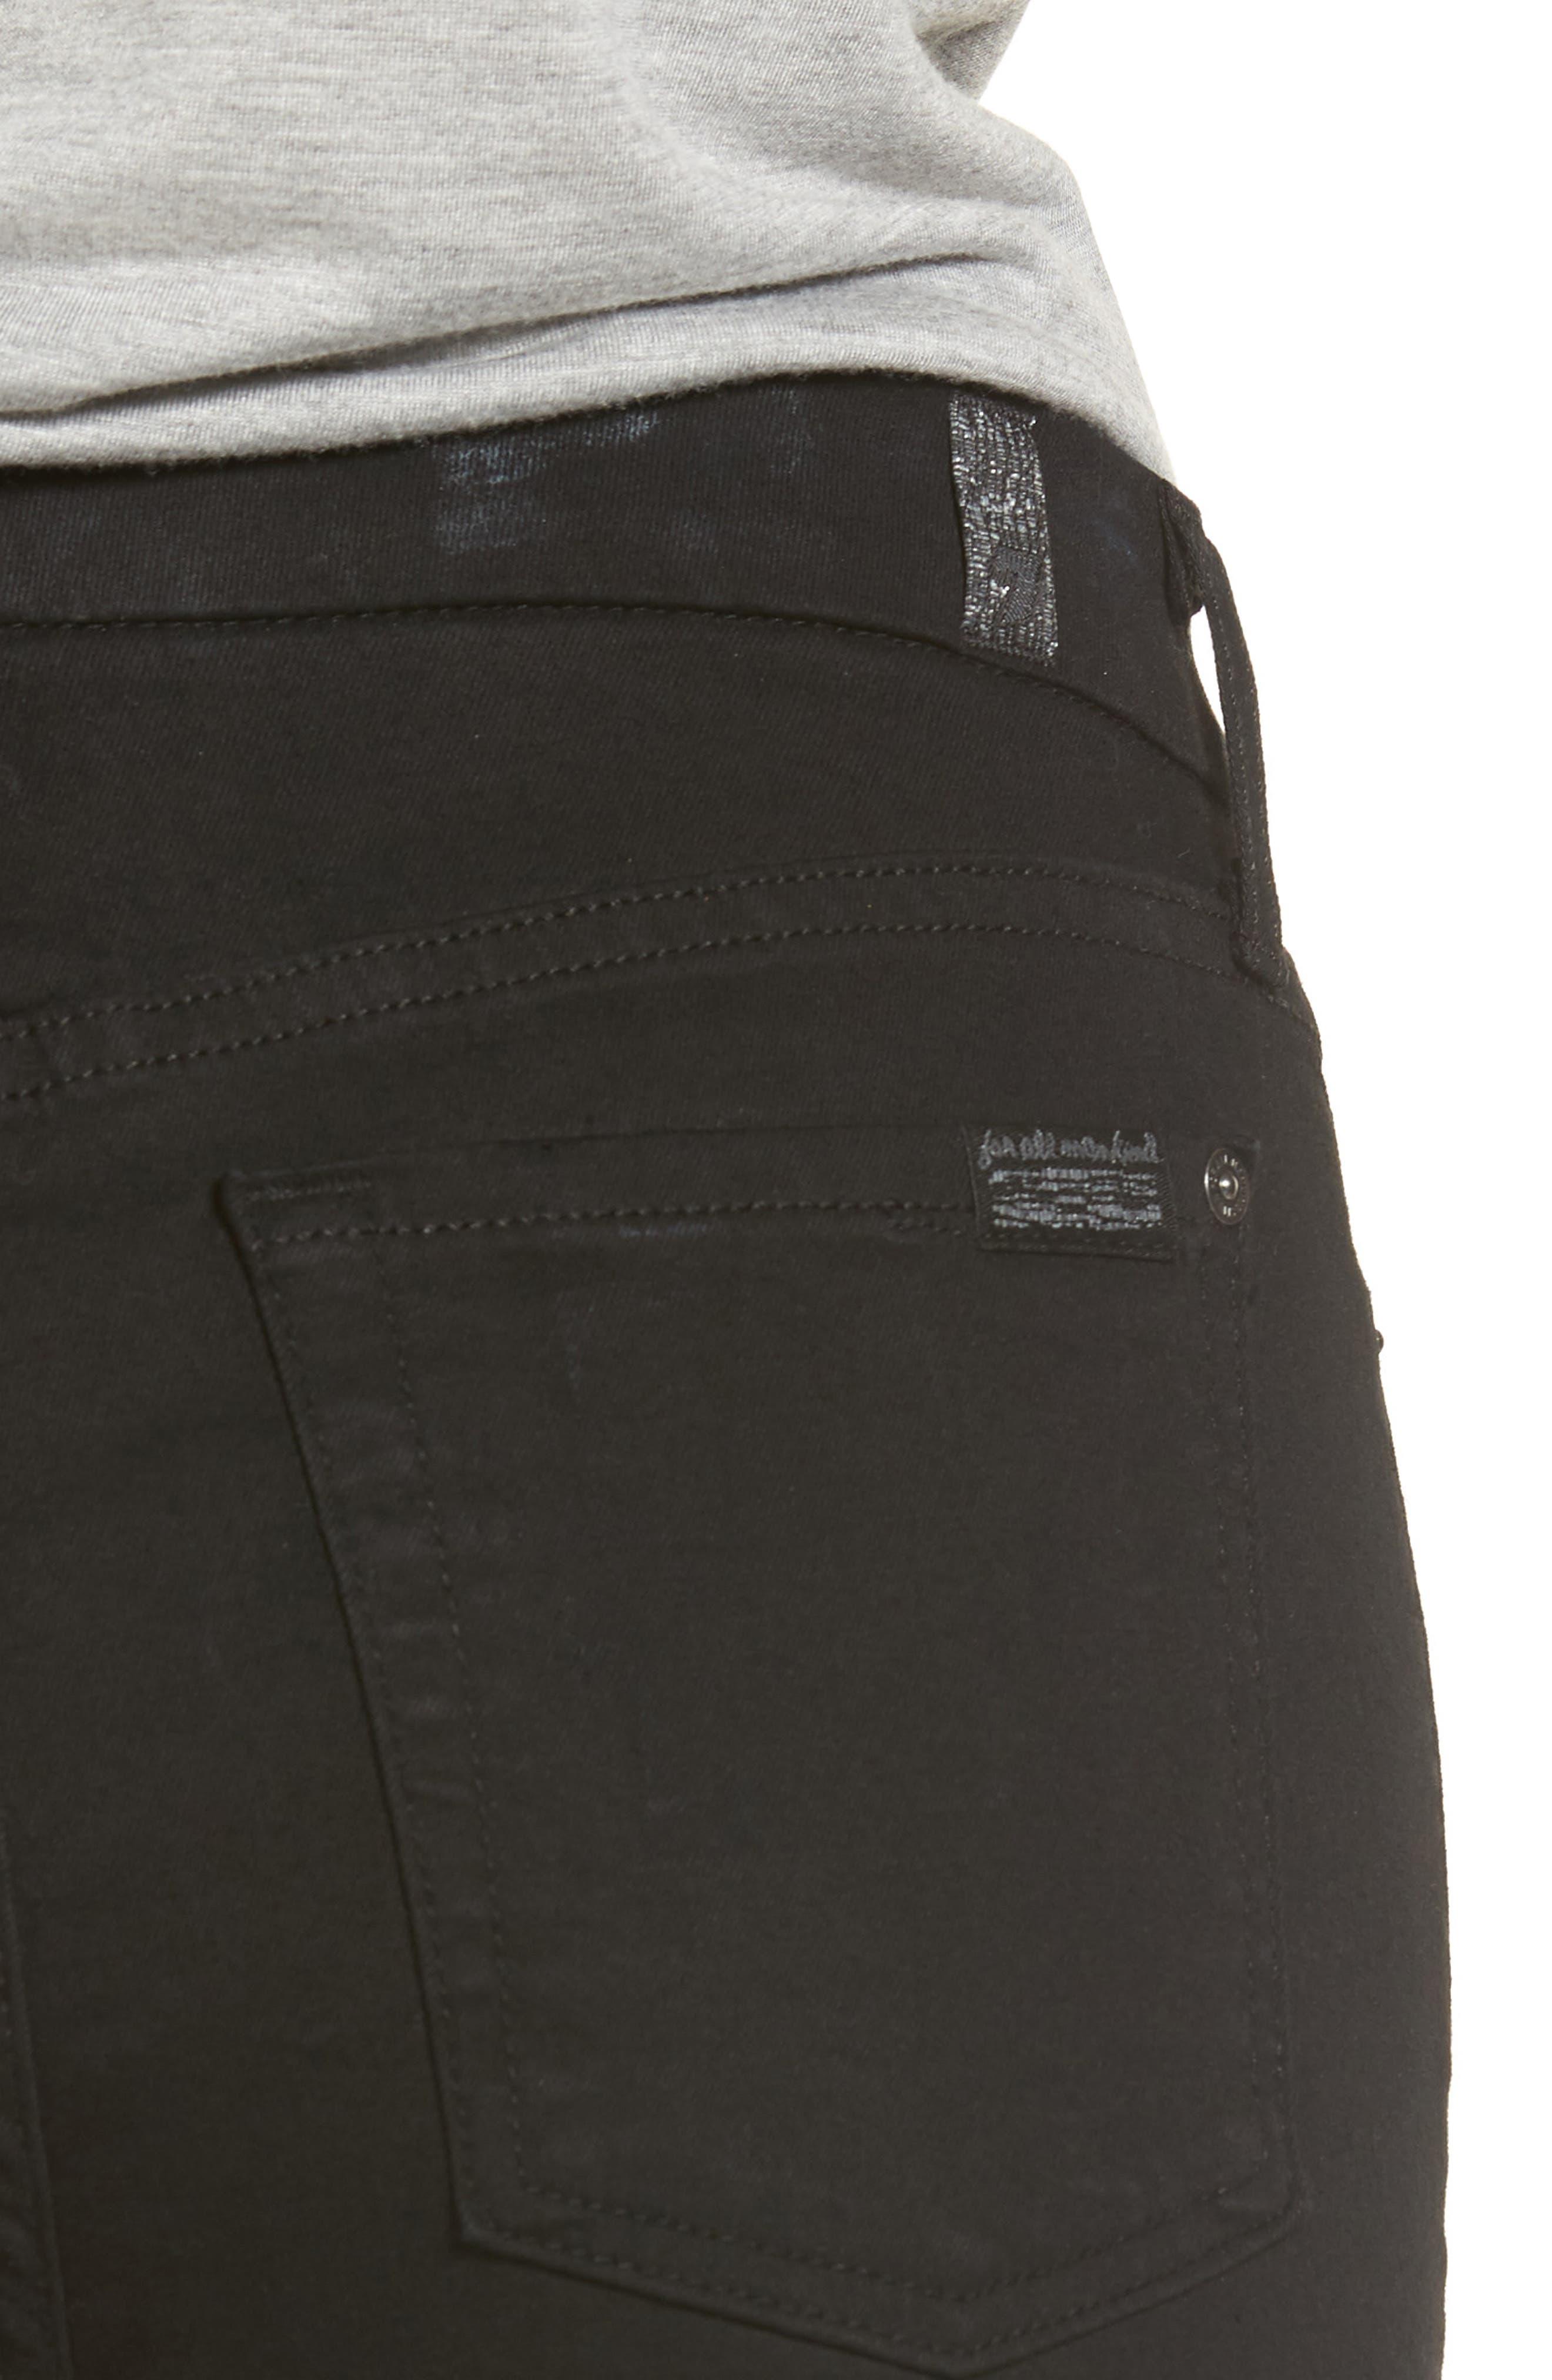 b(air) Ankle Skinny Jeans,                             Alternate thumbnail 4, color,                             BAIR BLACK 3